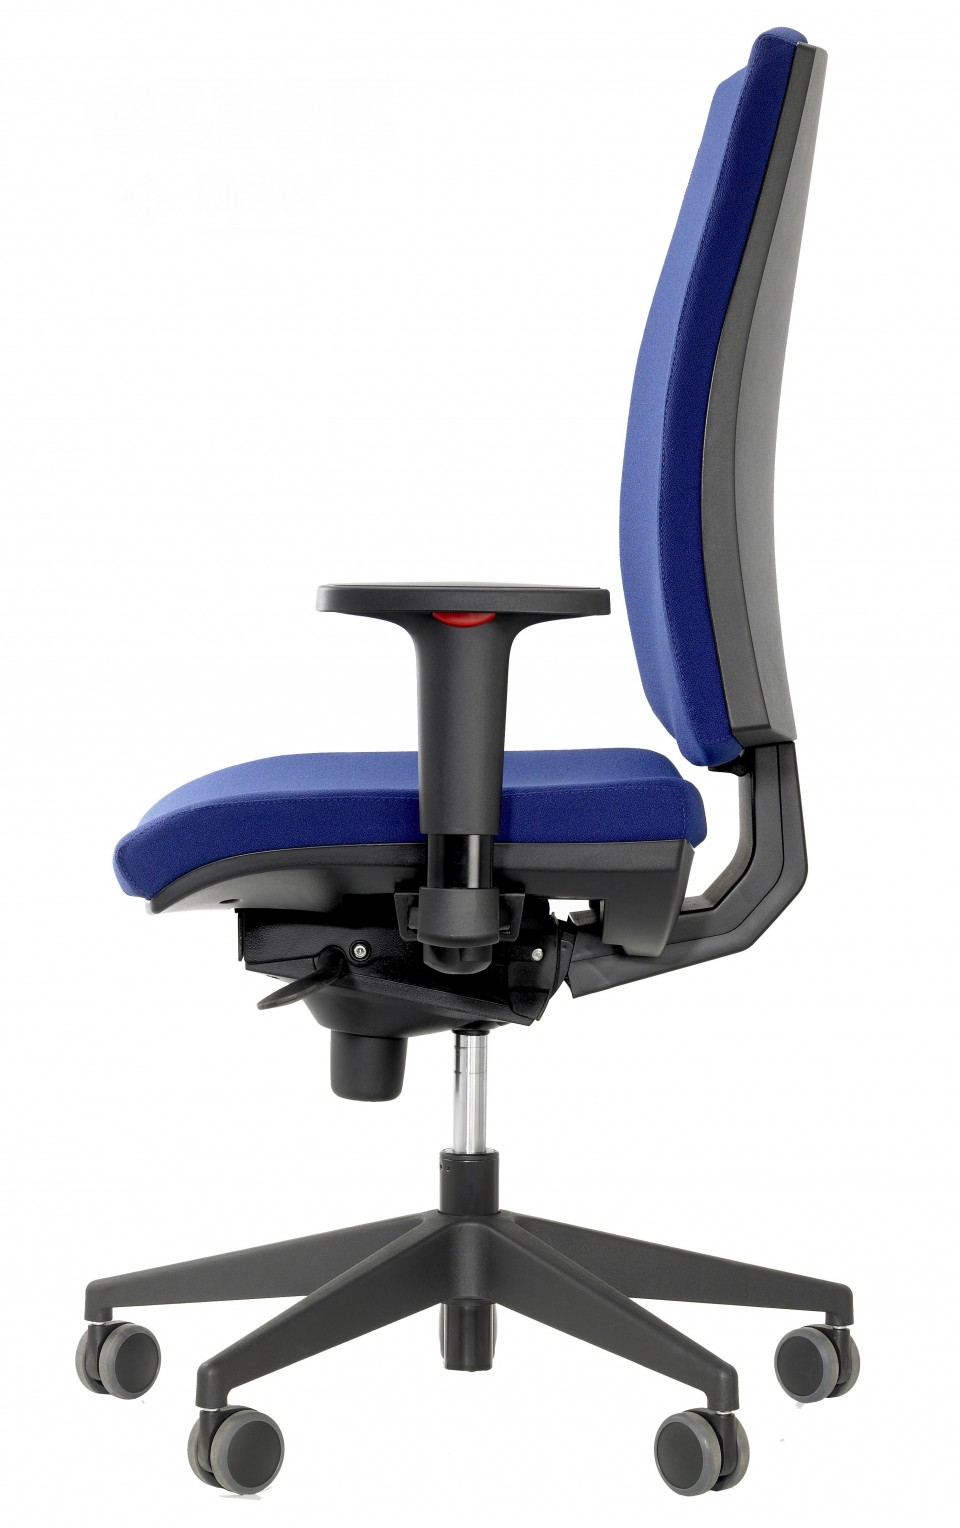 fauteuil de bureau ergonomique go hd. Black Bedroom Furniture Sets. Home Design Ideas